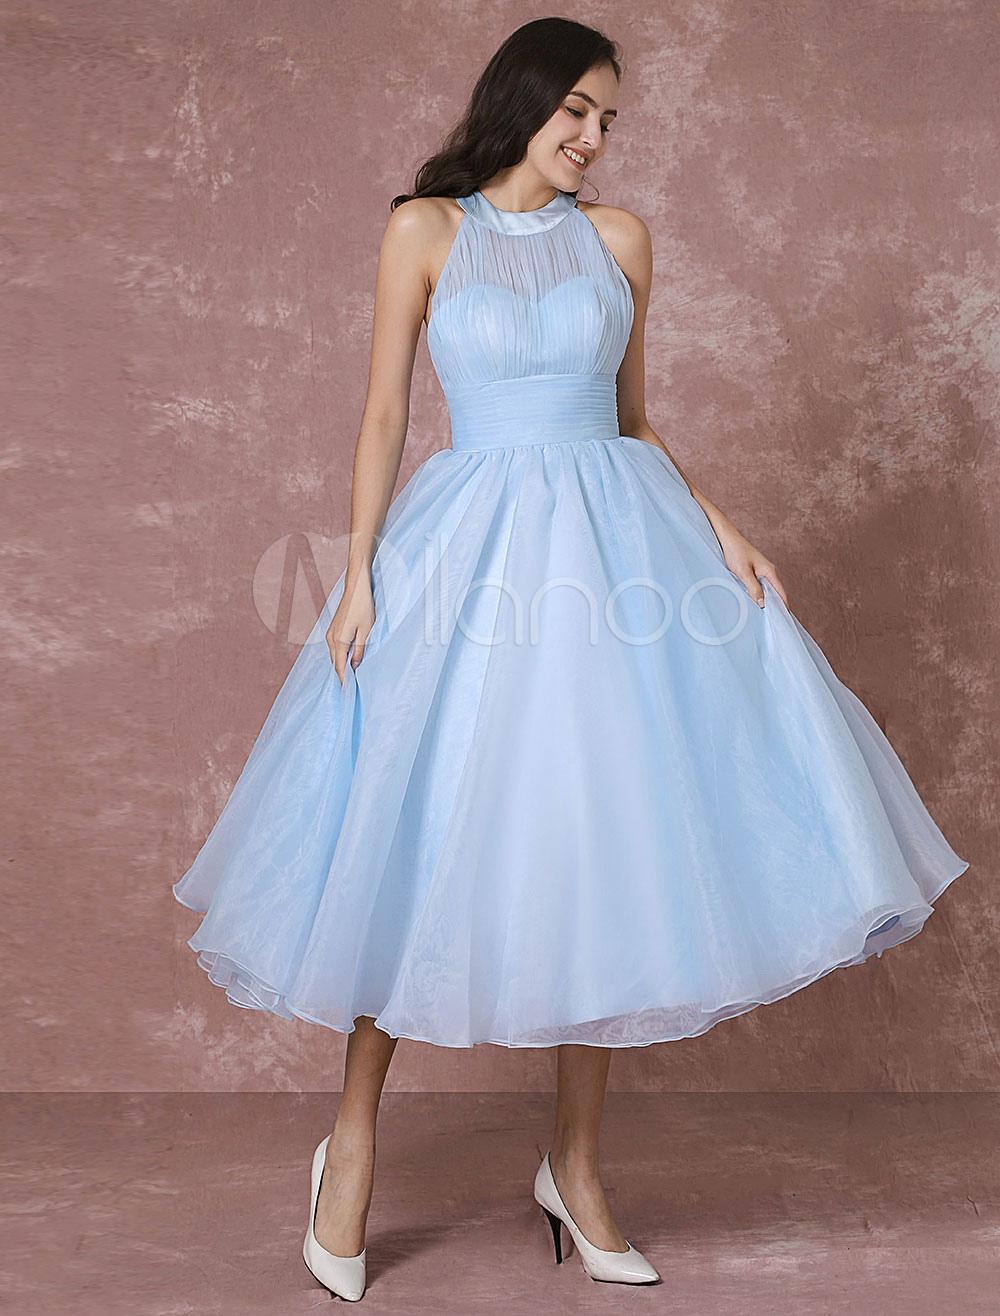 Blue Wedding Dress Short Tulle Vintage Bridal Dress Halter Backless Ball Gown Cocktail Dress Tea-length Party Dress Milanoo photo